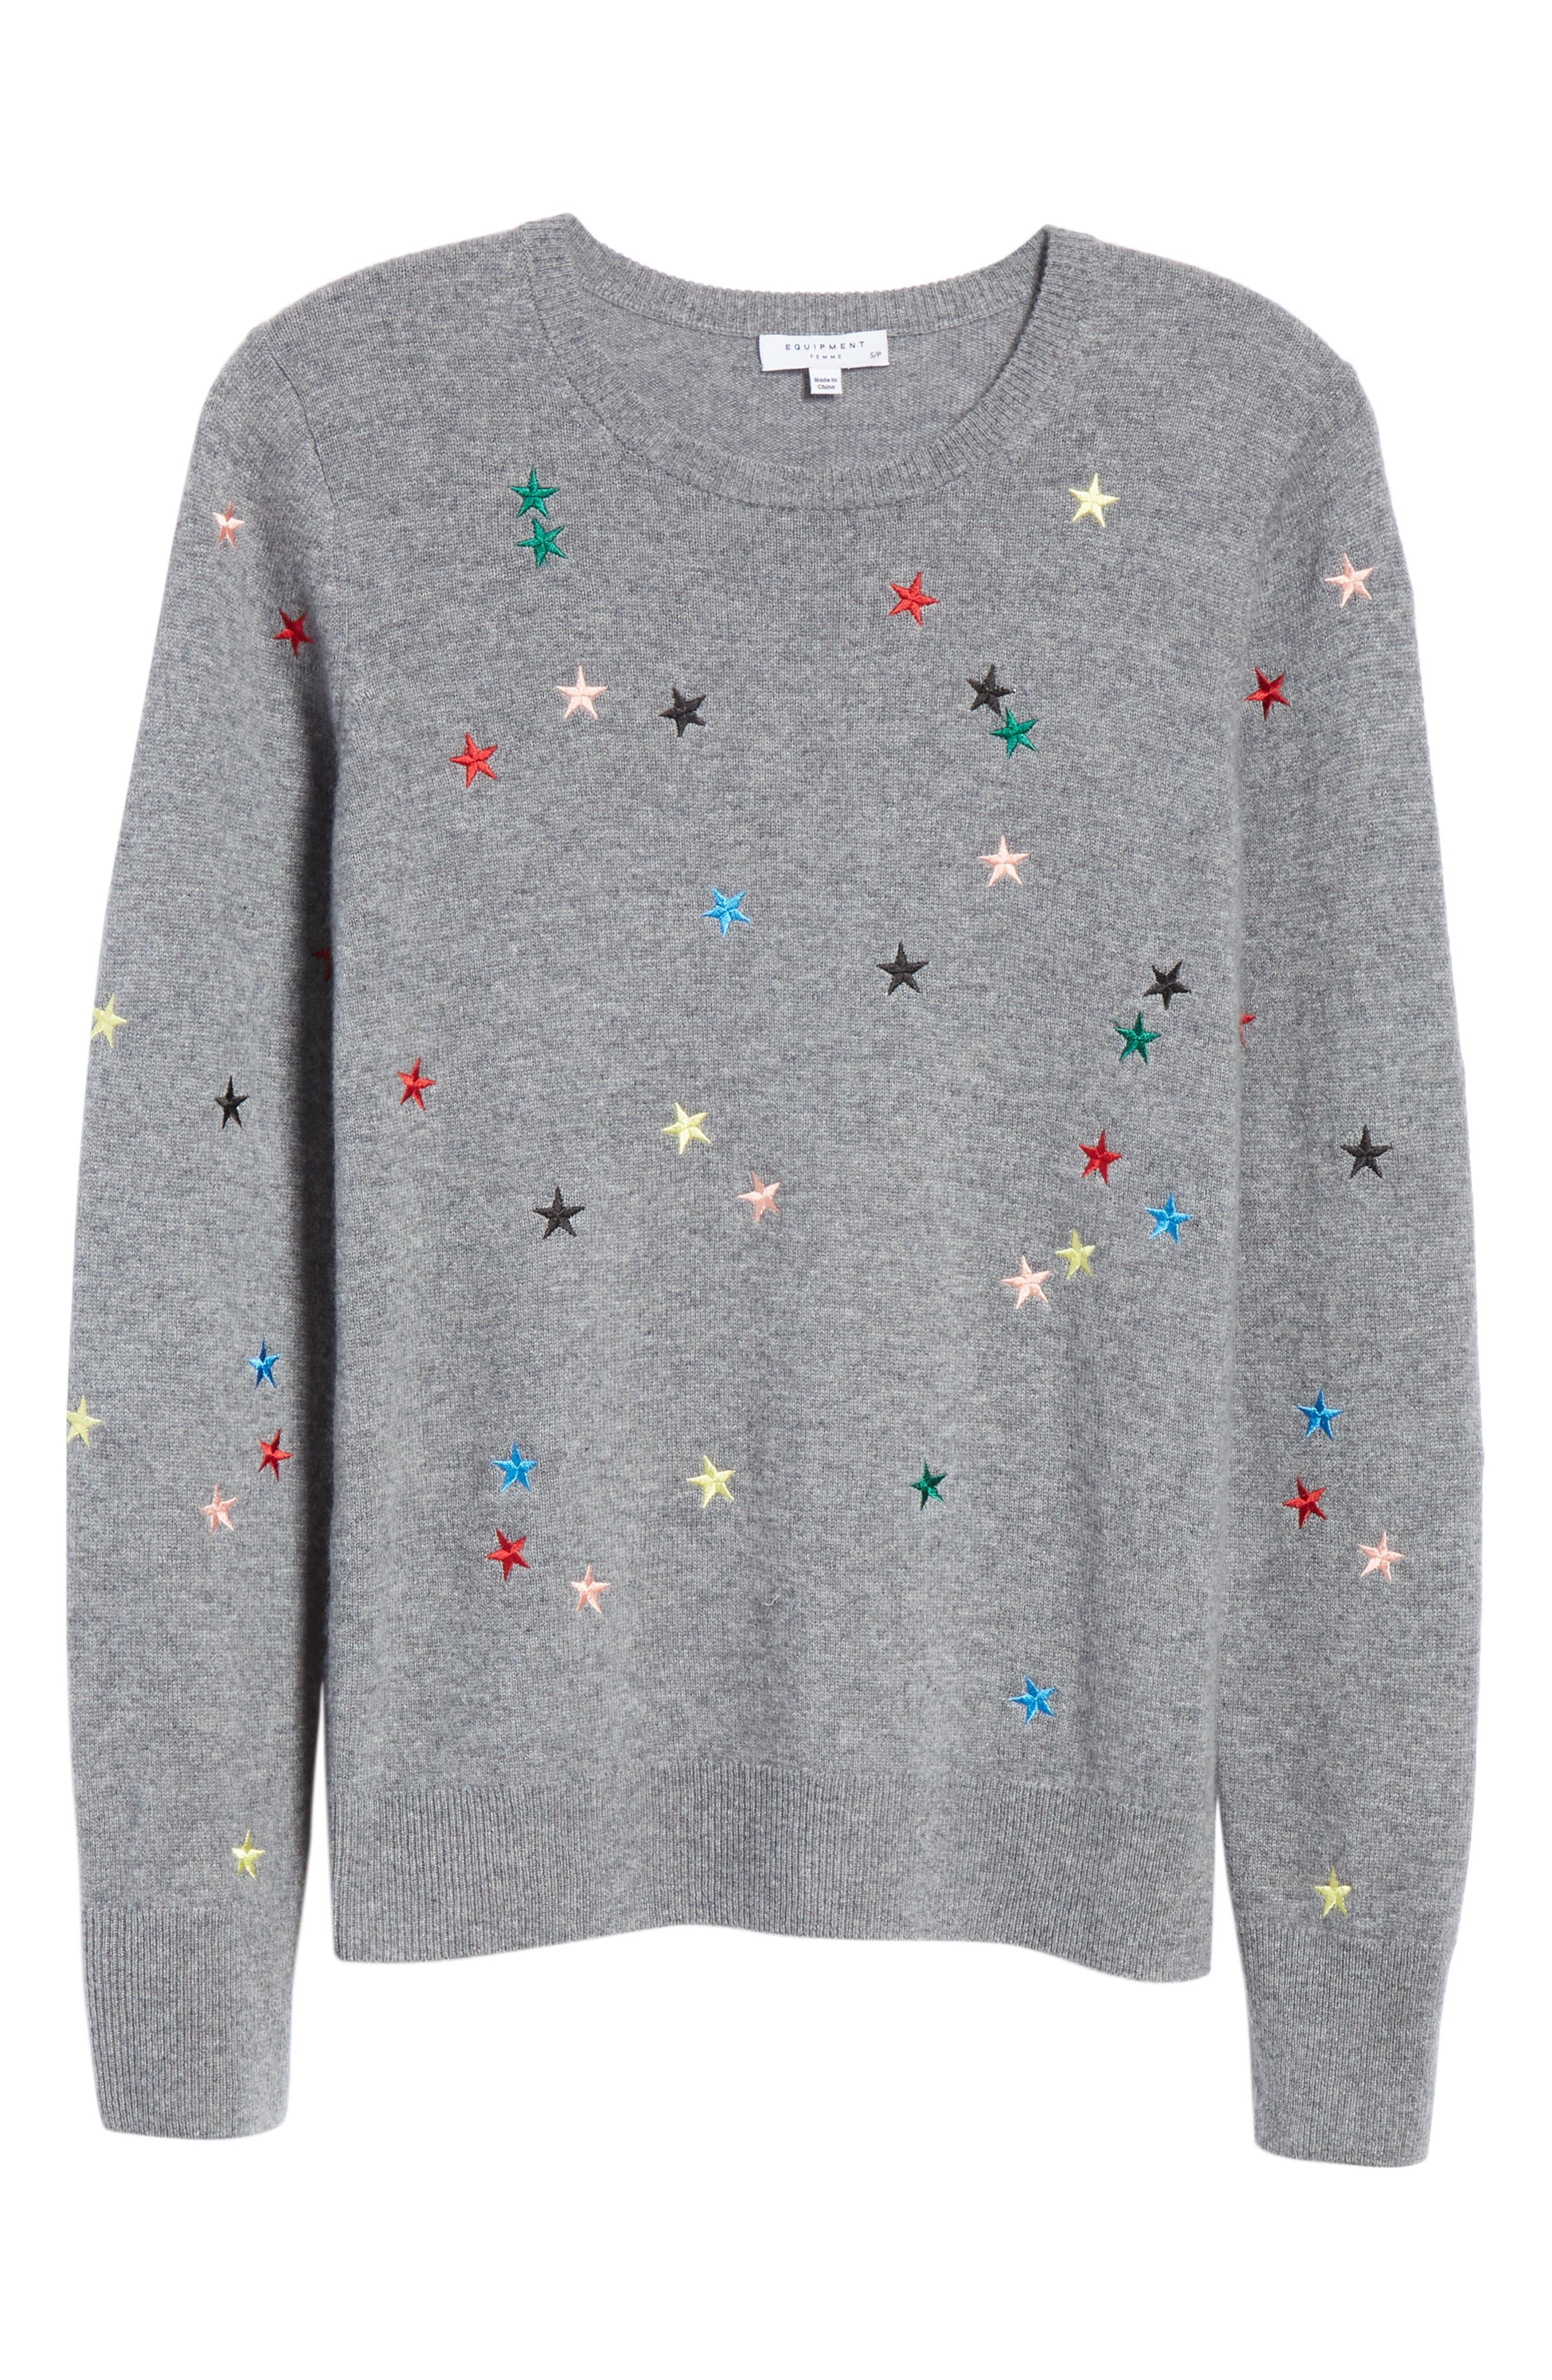 Shane Star Cashmere Sweater,                             Alternate thumbnail 6, color,                             030